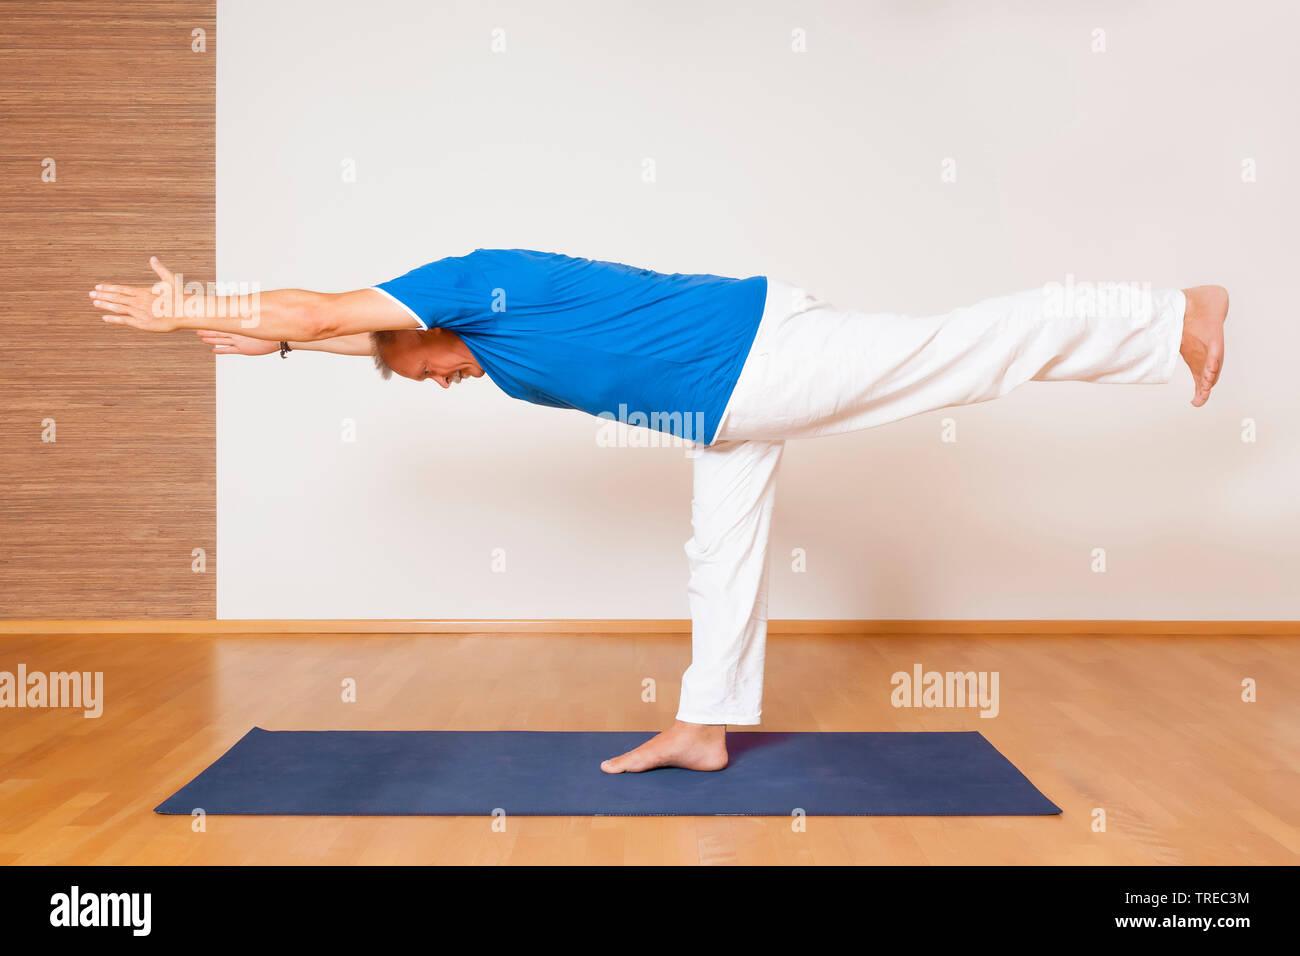 Mann machen Yoga-Uebung, Krieger III, Europa | man doing yoga, warrior, Europe | BLWS522599.jpg [ (c) blickwinkel/McPHOTO/M. Gann Tel. +49 (0)2302-279 - Stock Image